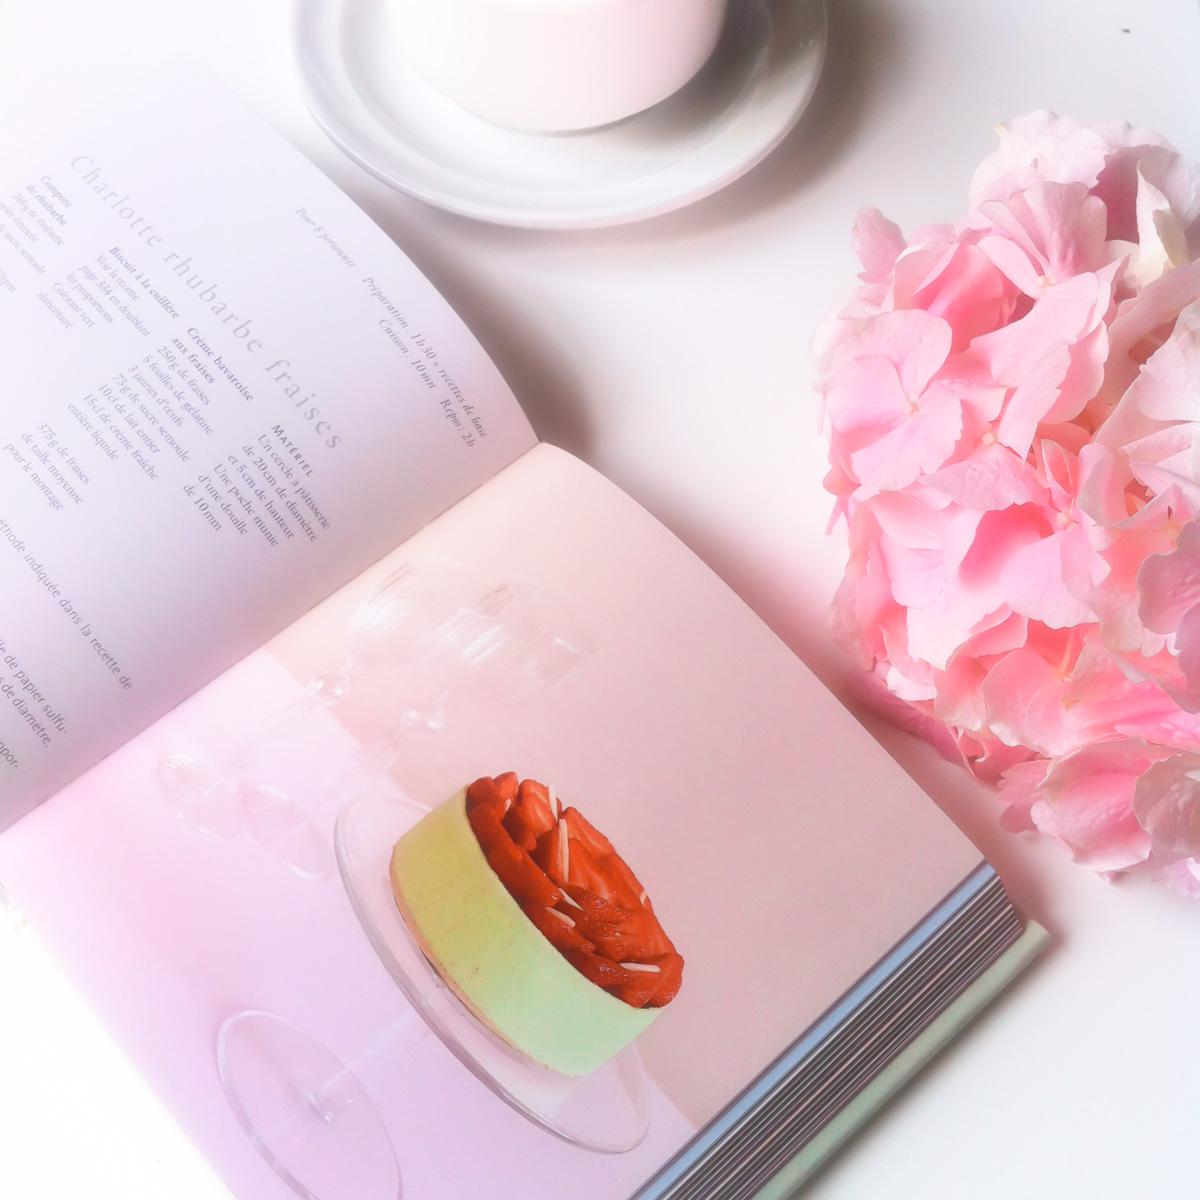 laduree-recipes-6